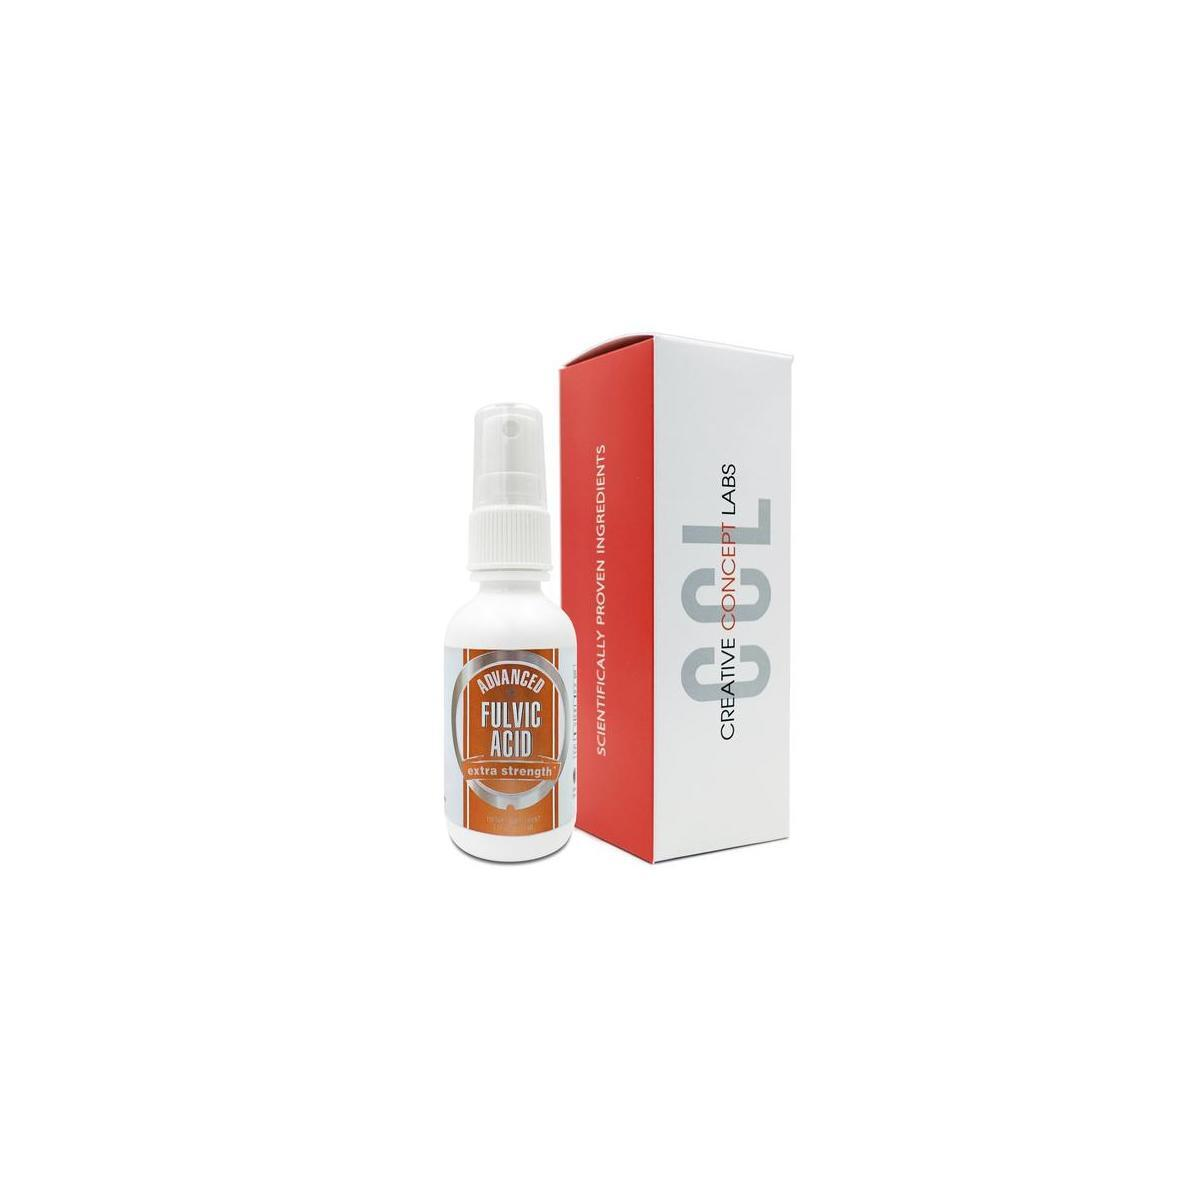 Advanced Fulvic Acid Spray - 72+ Trace Essential Trace Minerals